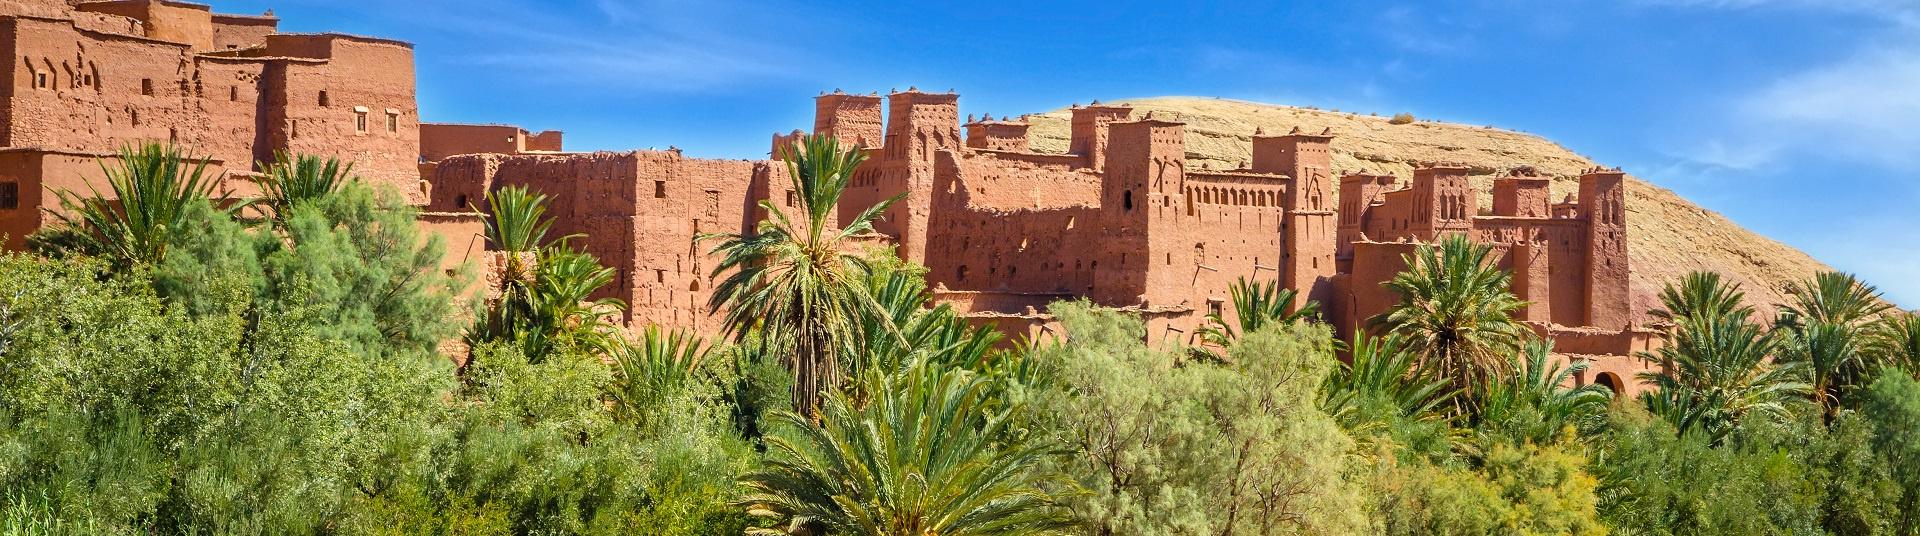 Week-end pas cher Maroc